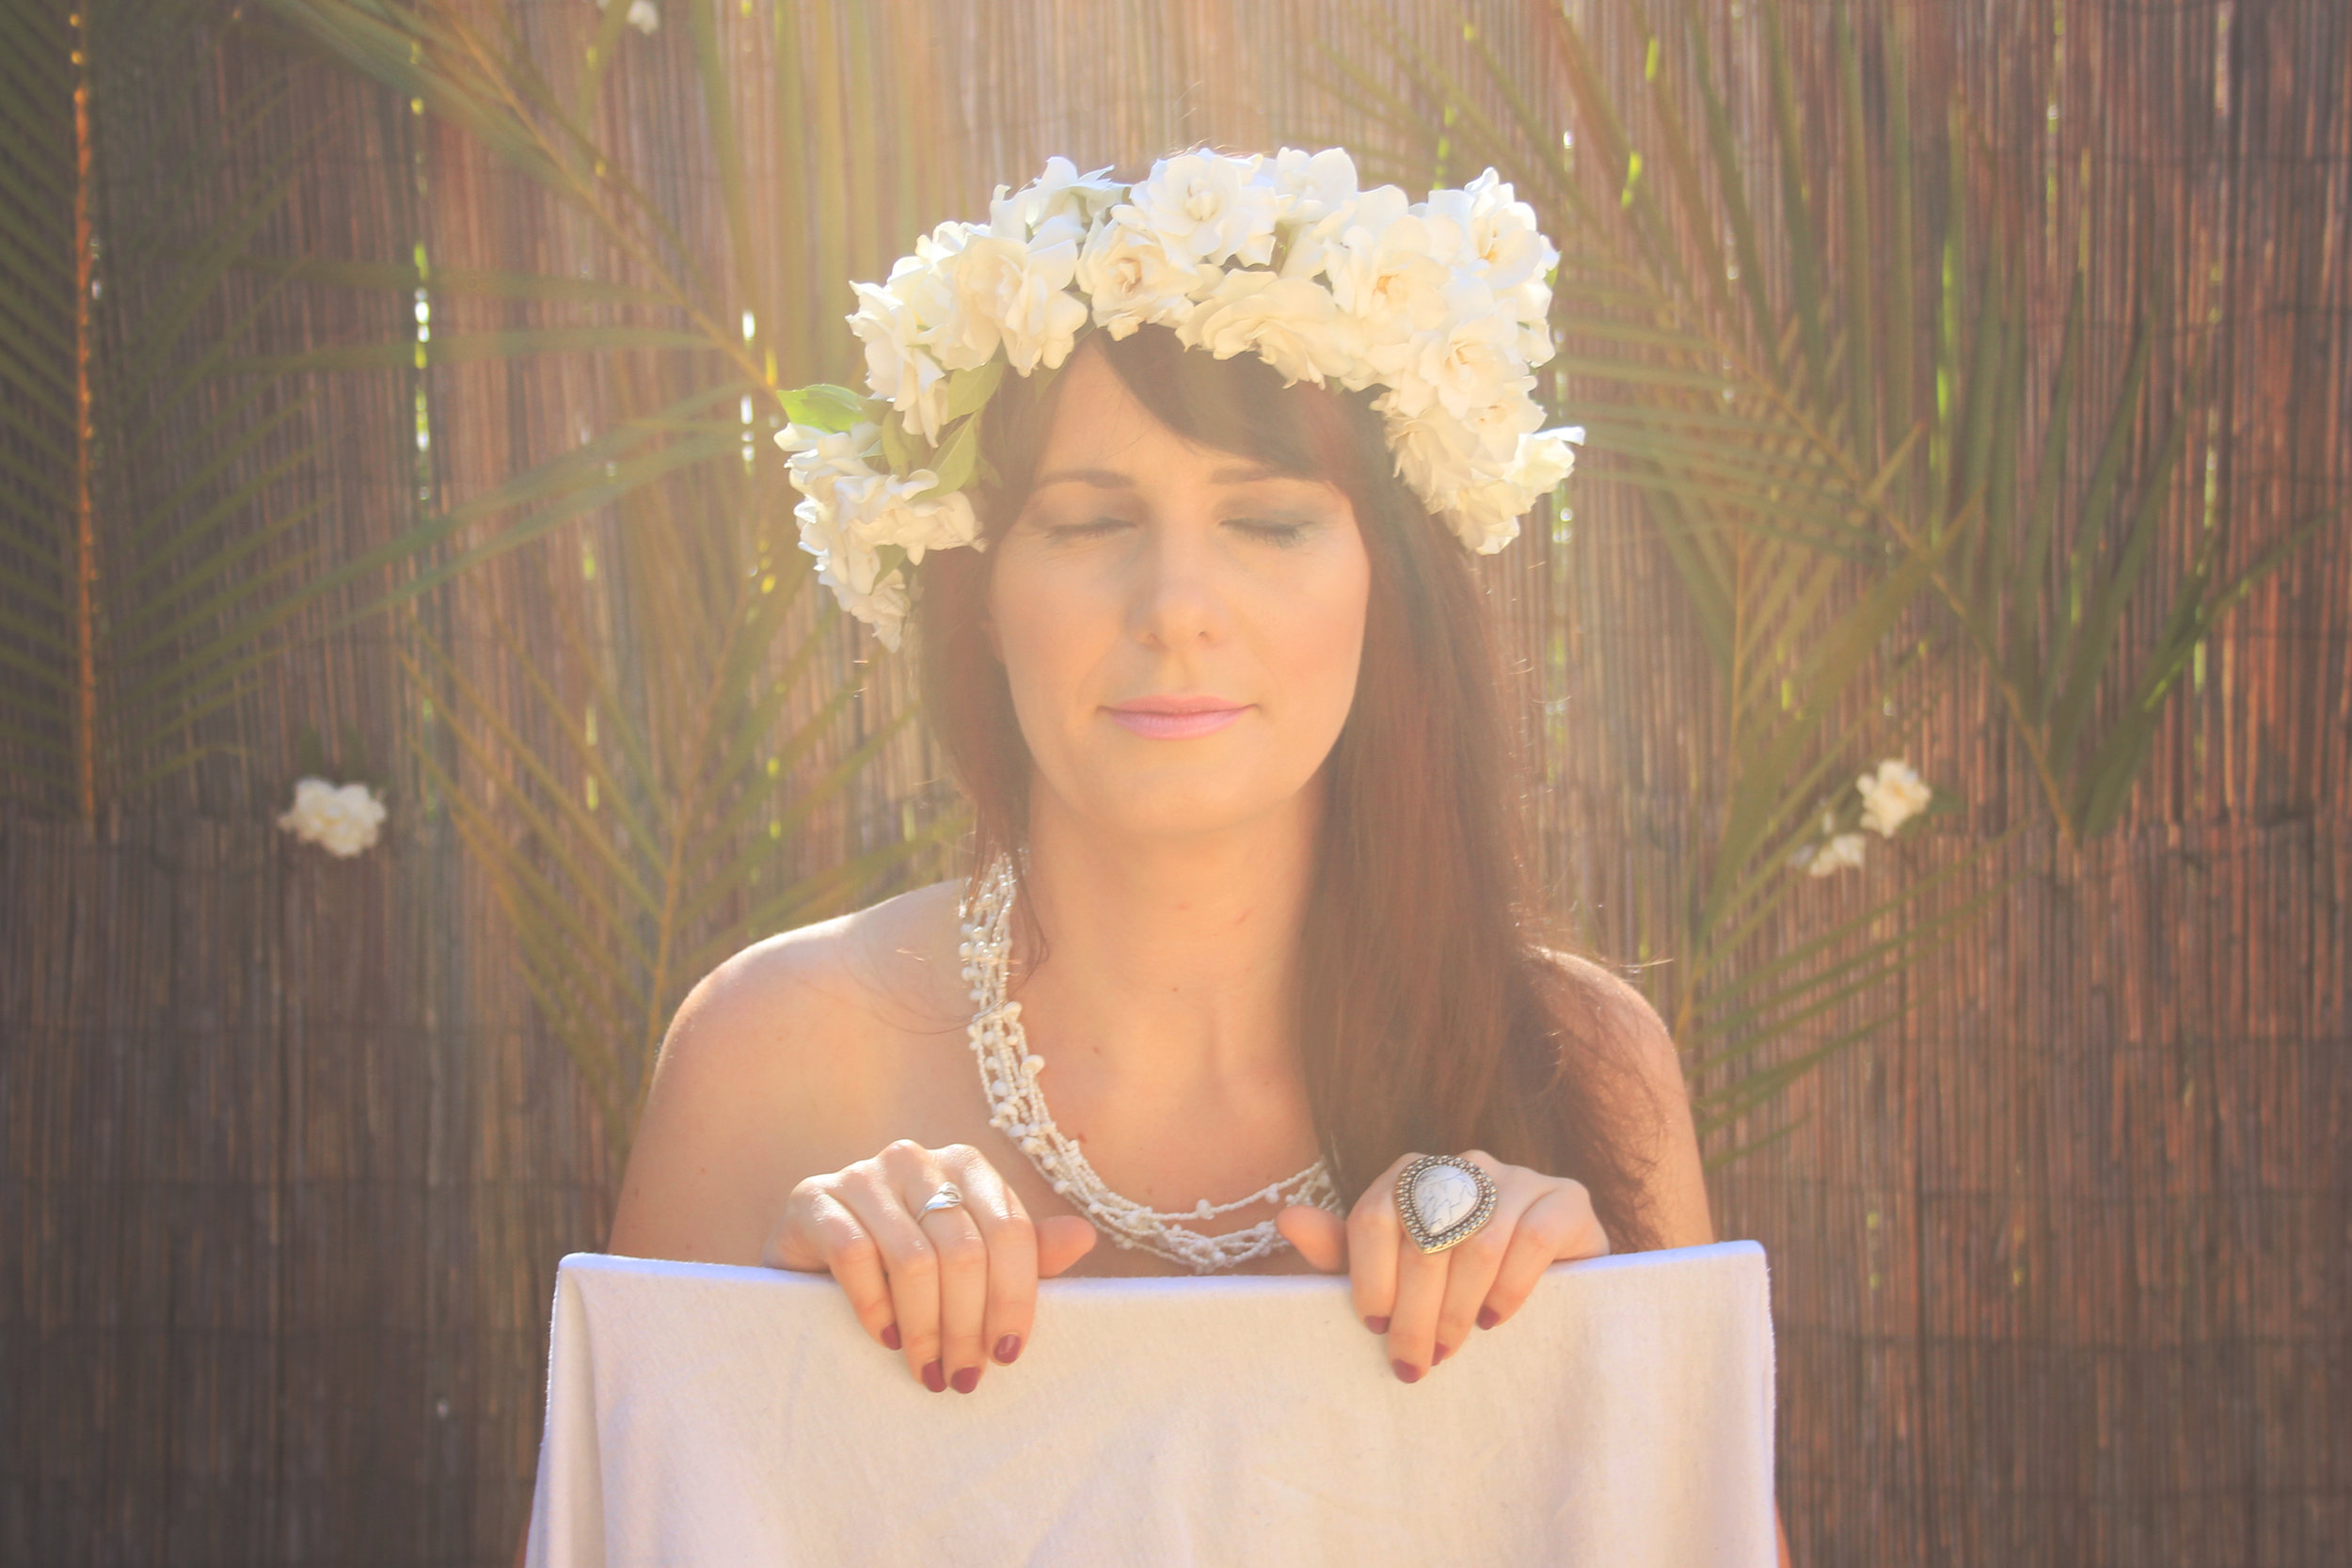 Dancing Blossom Studio Foraged Flower Crown Portrait.jpg